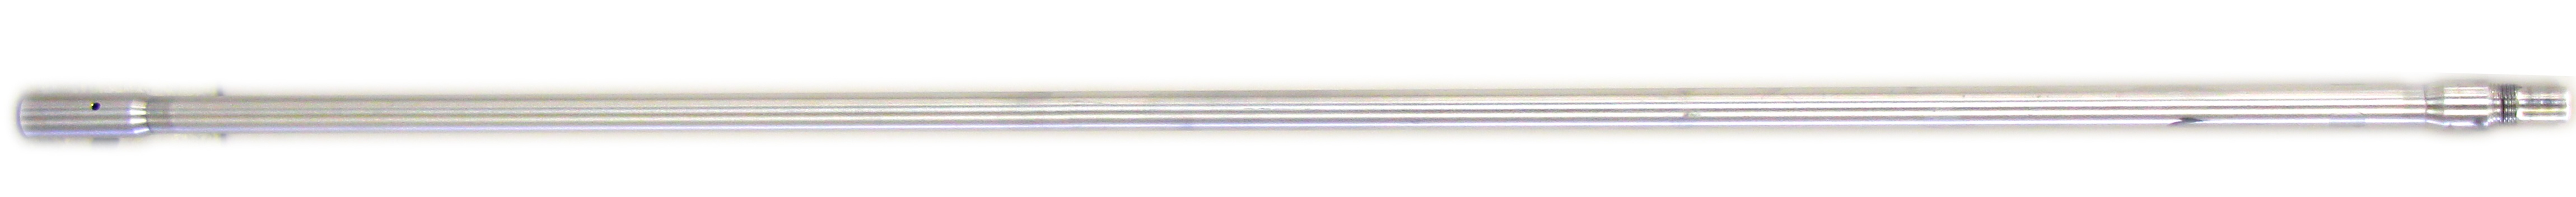 PE-22-22.jpg